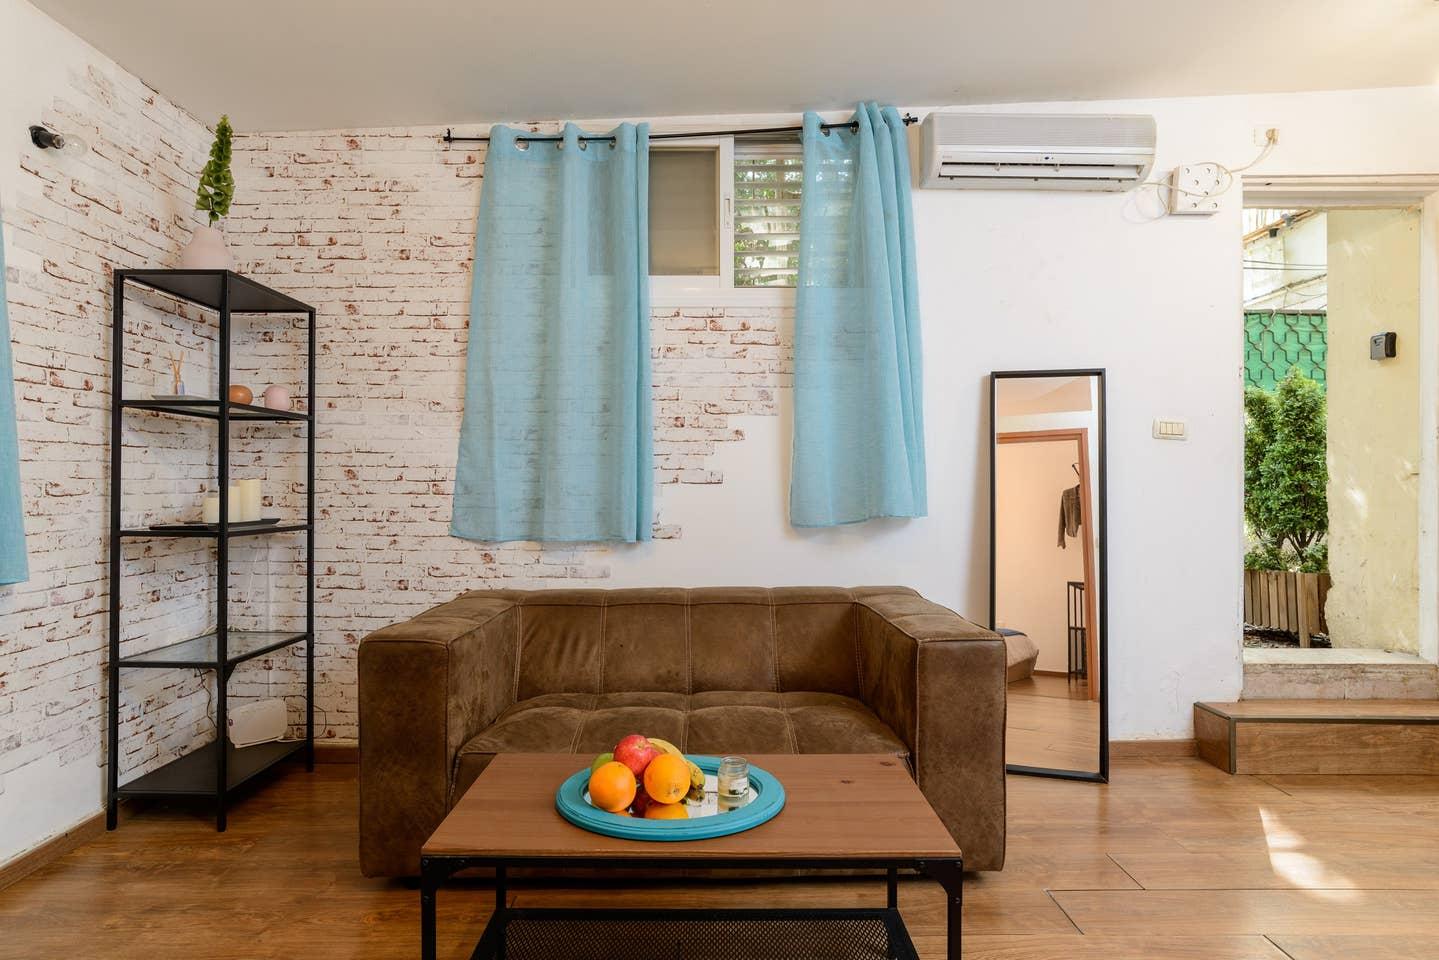 Designed apartment on Frishman Tlv photo 26055854